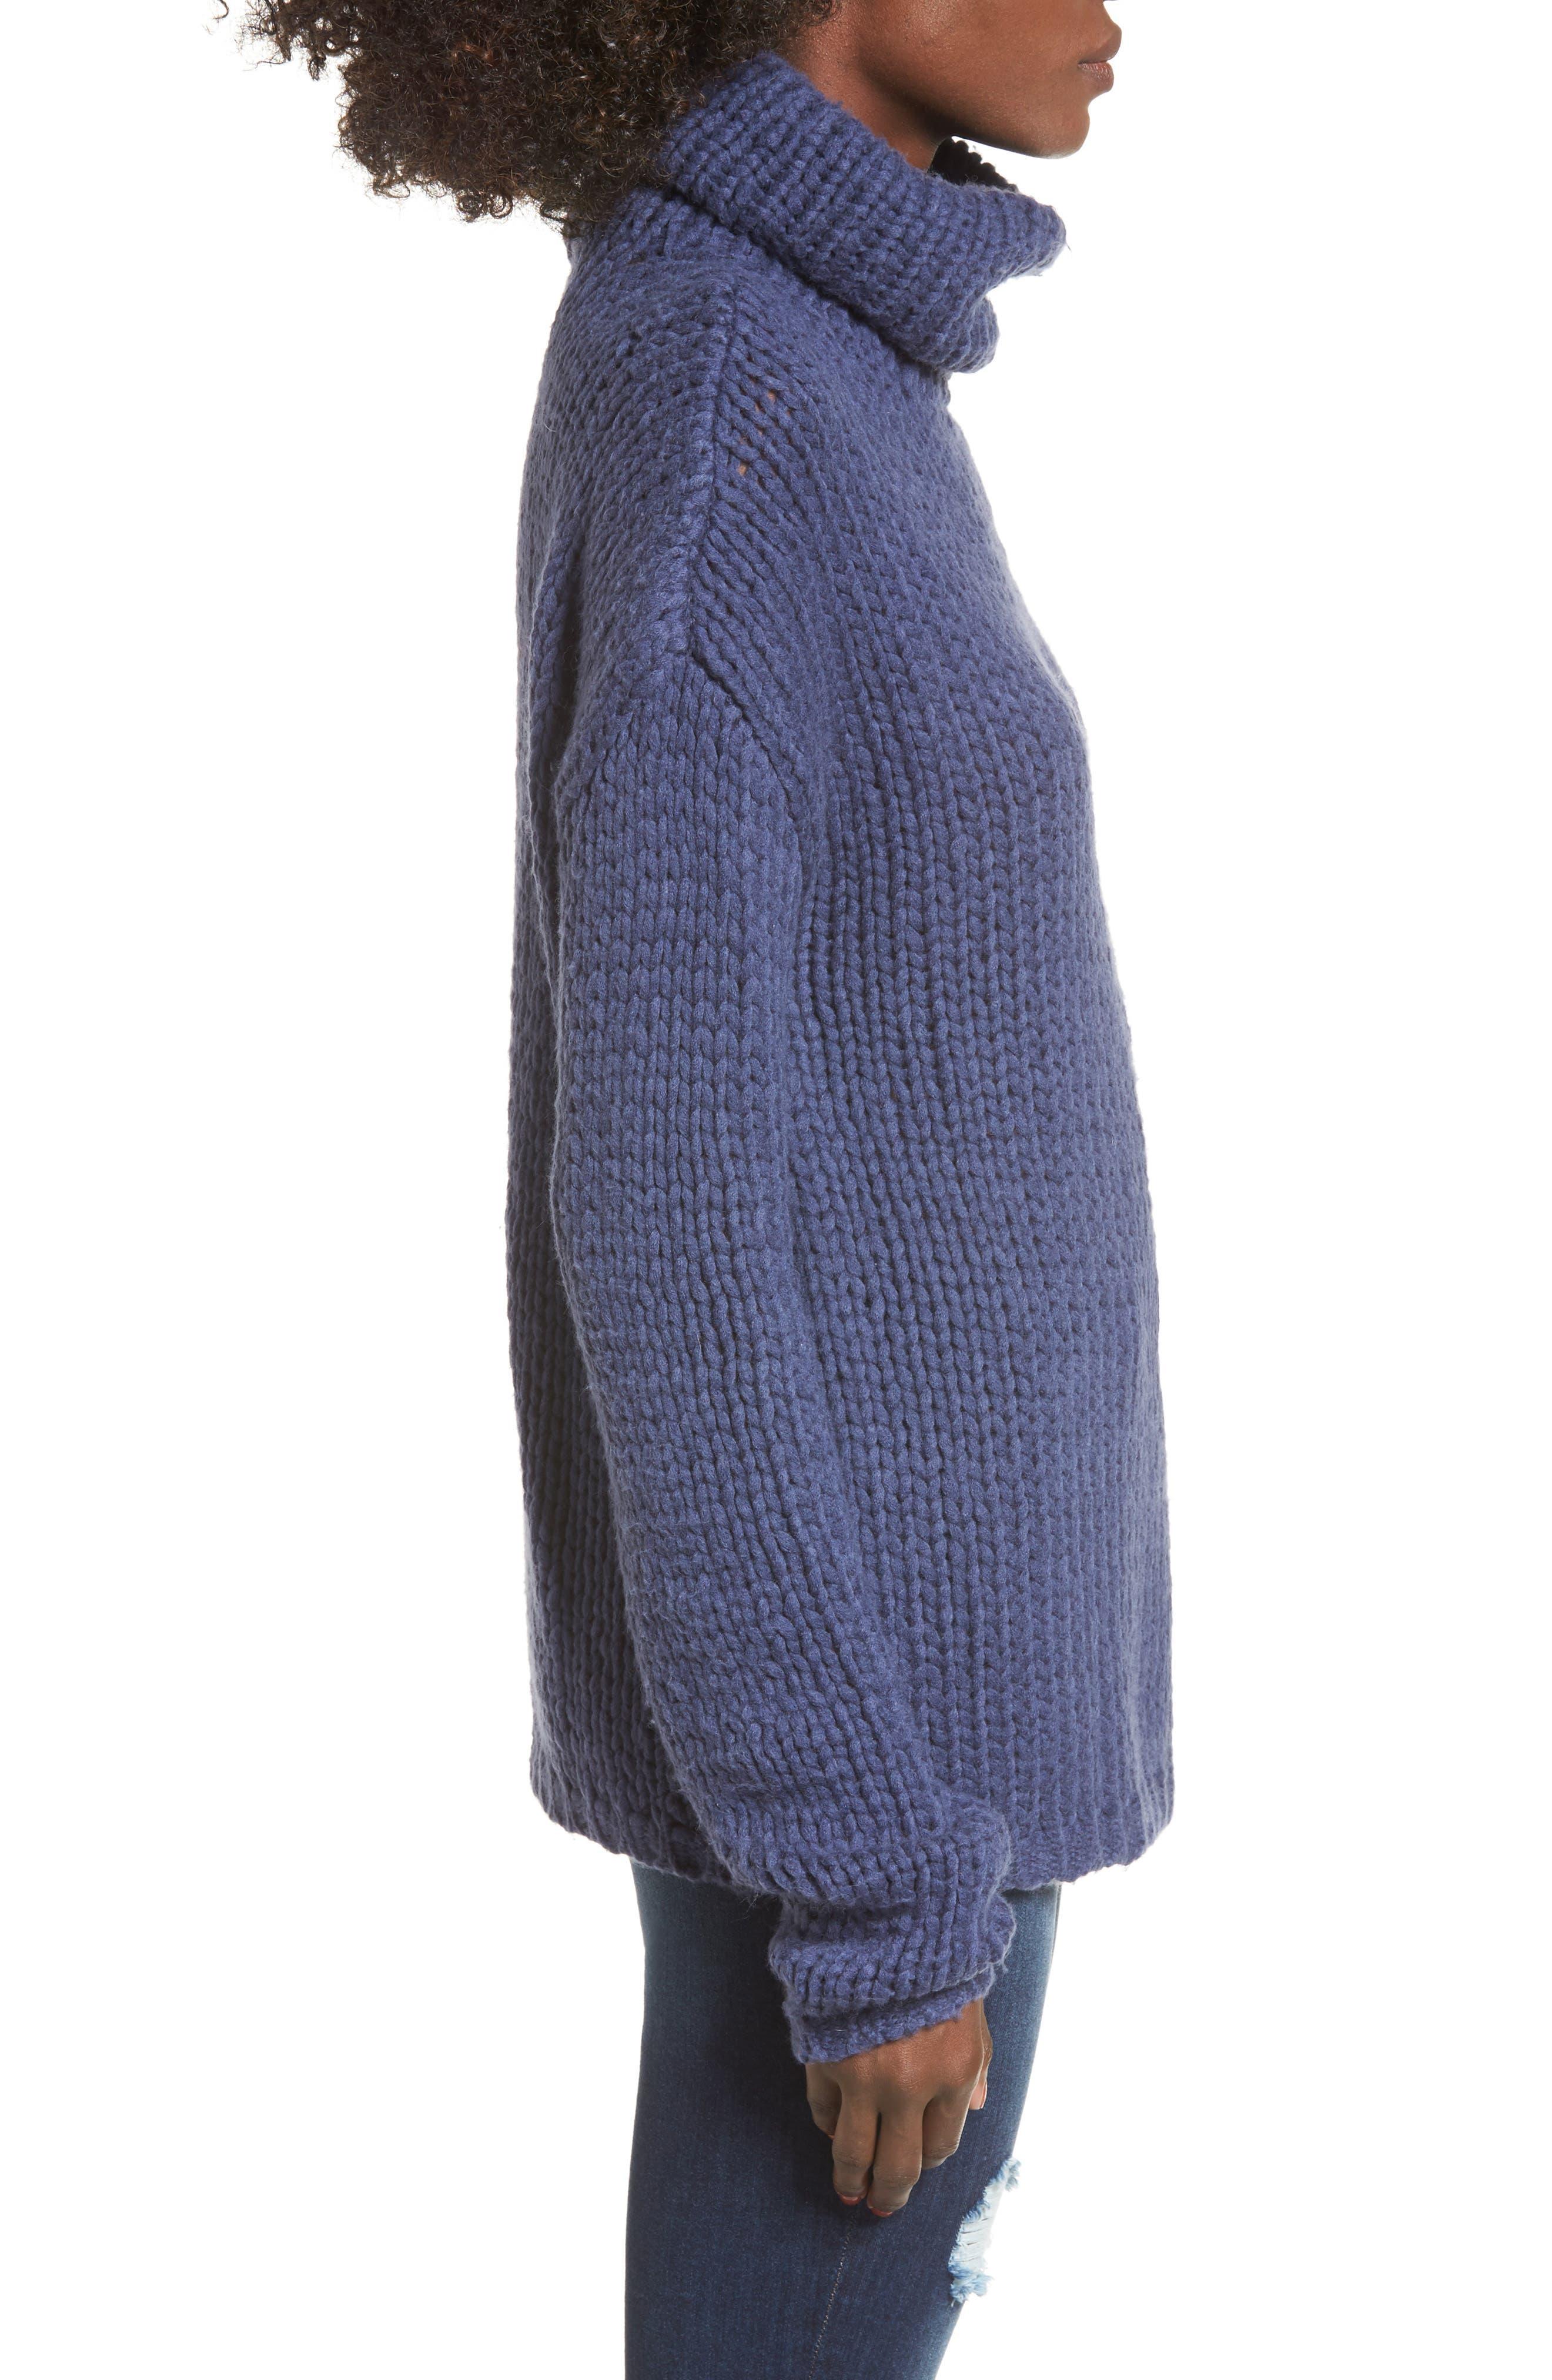 Hawken Turtleneck Sweater,                             Alternate thumbnail 3, color,                             400